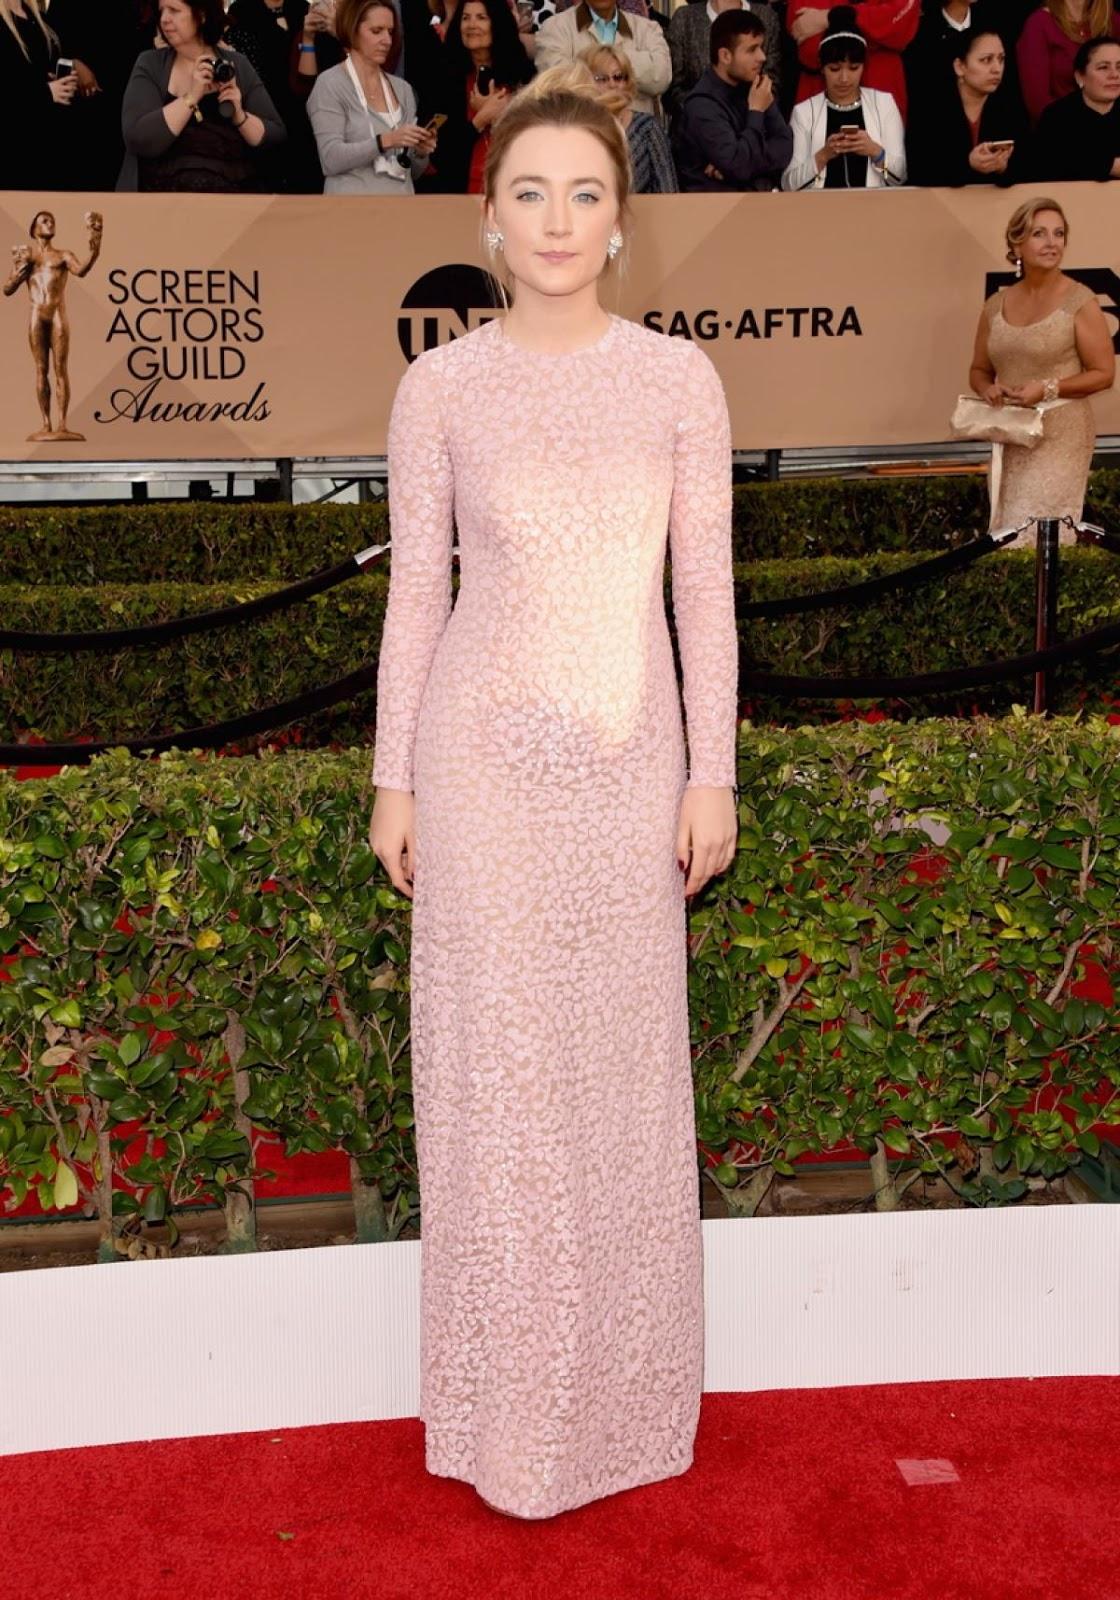 Repaso estrella: Screen Actors Guild Awards 2016